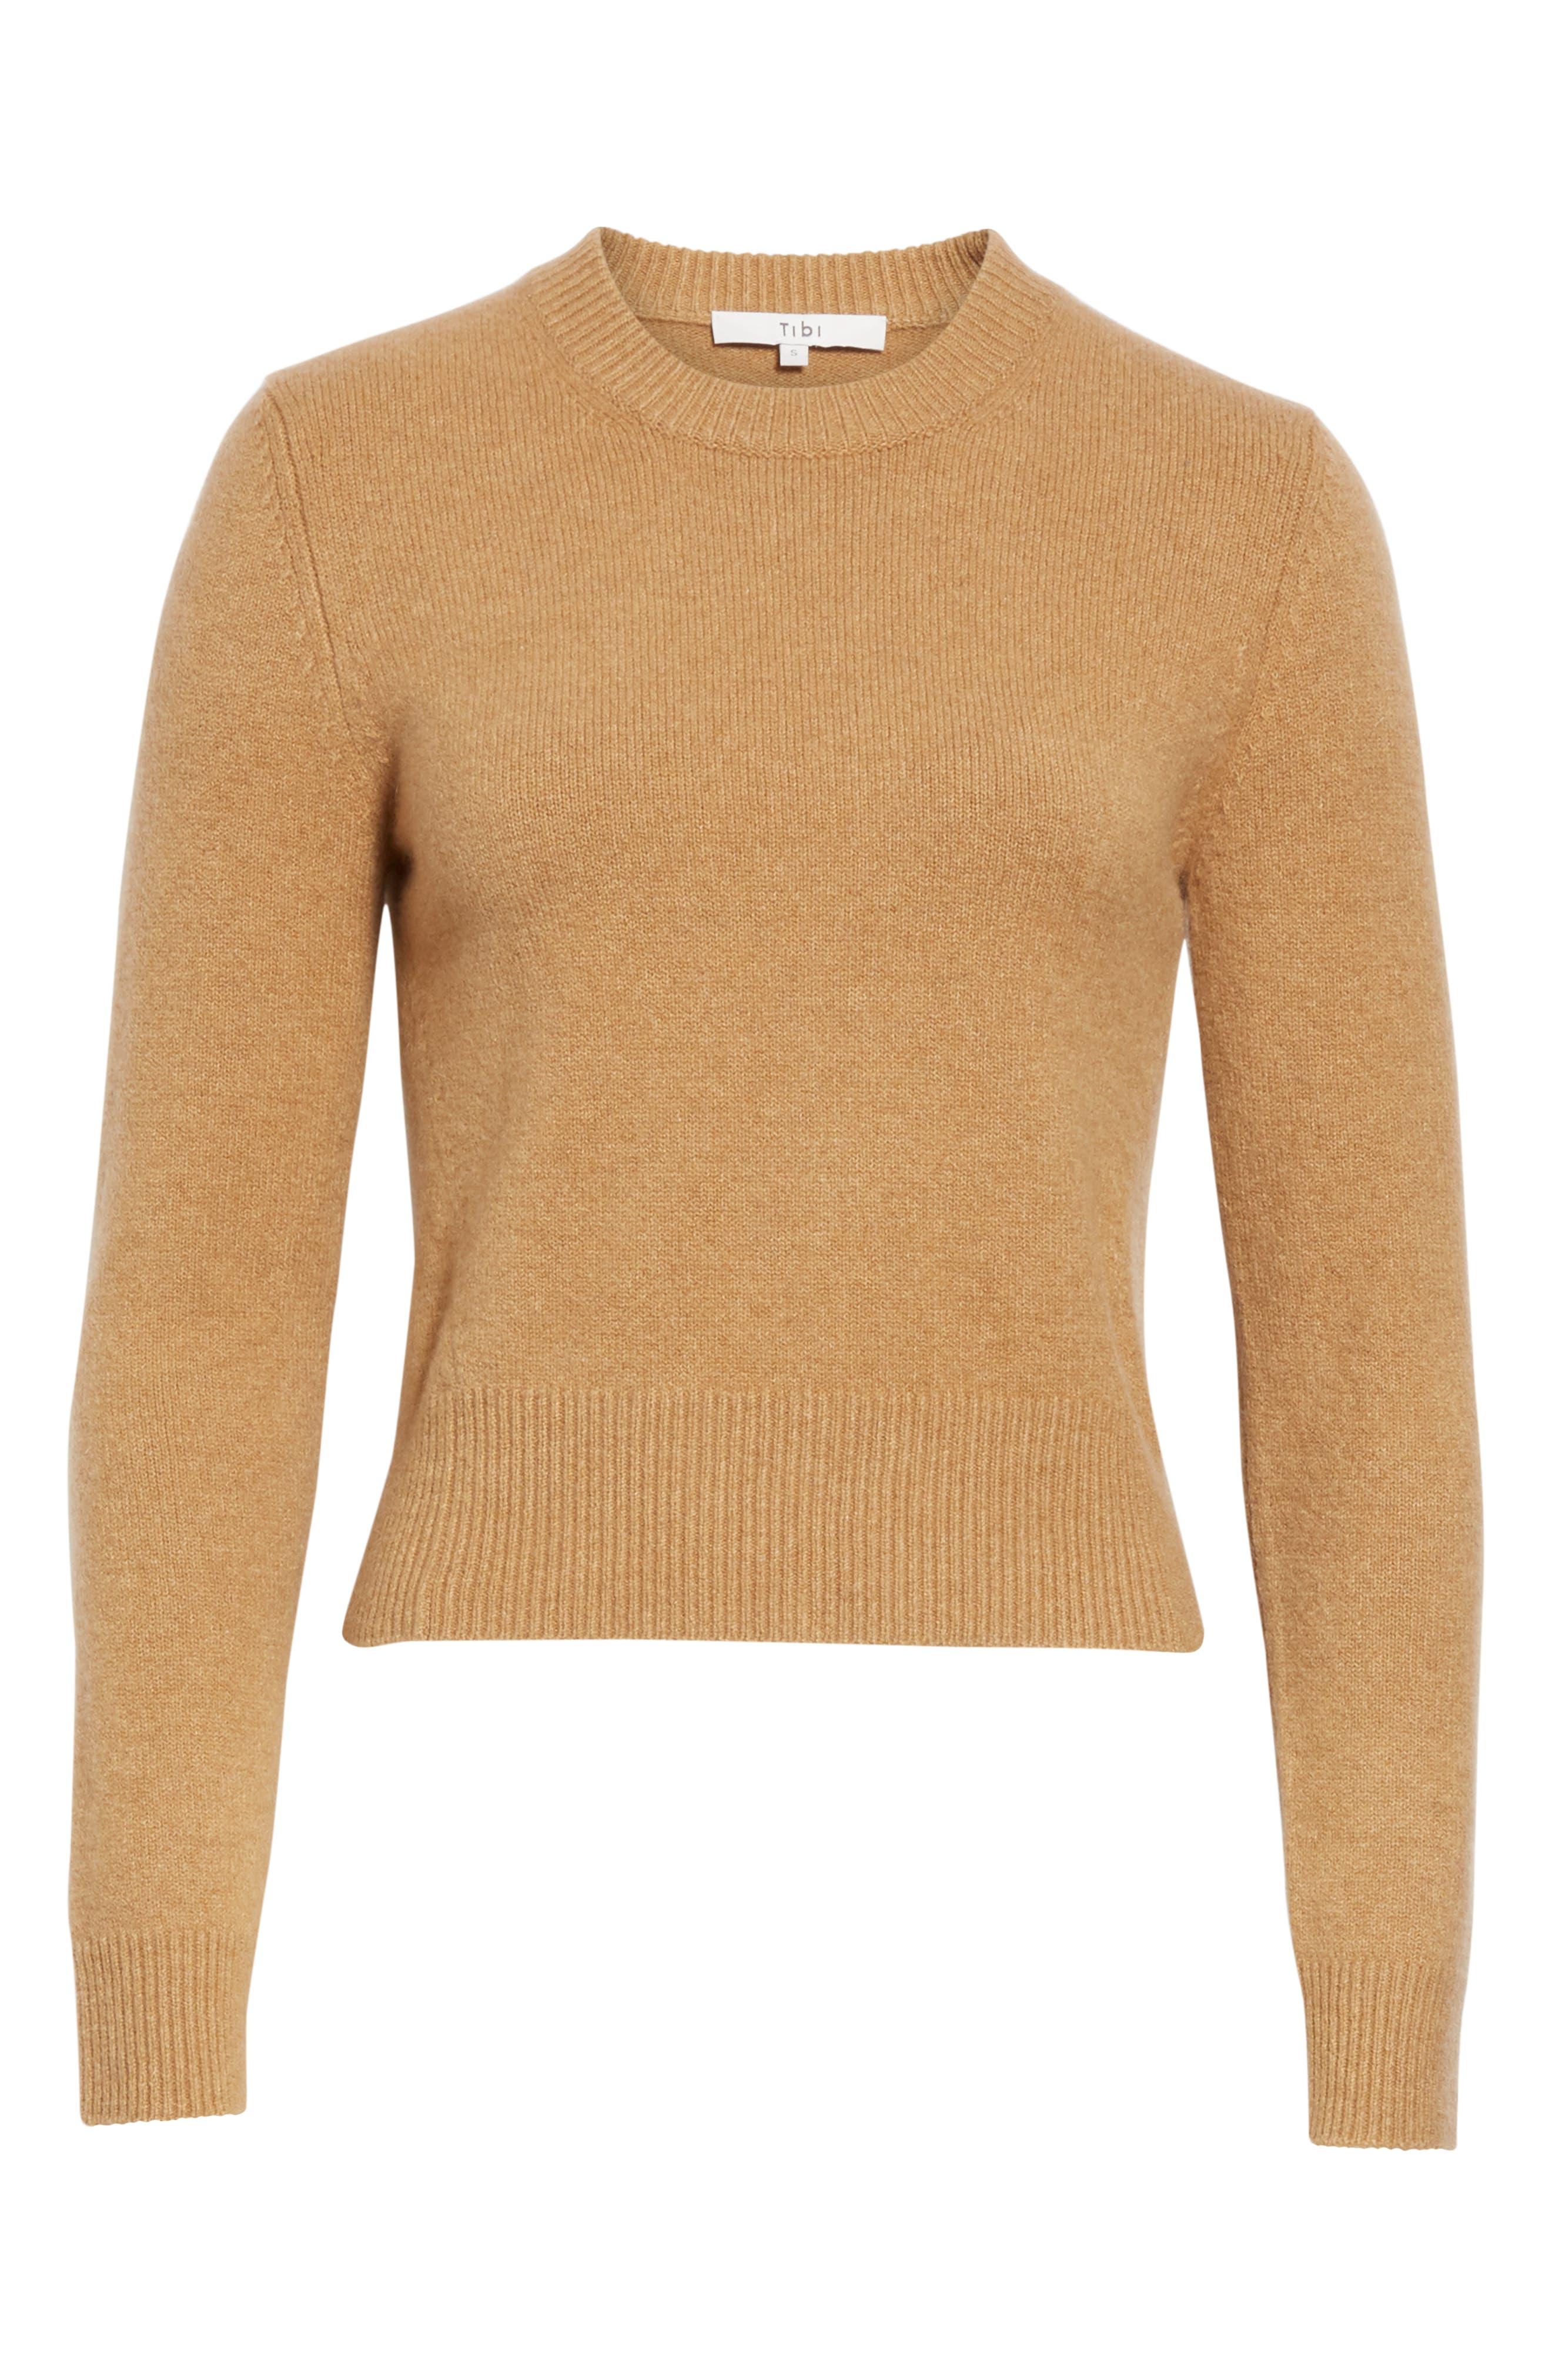 Stretch Cashmere Sweater,                             Alternate thumbnail 6, color,                             CARAMEL